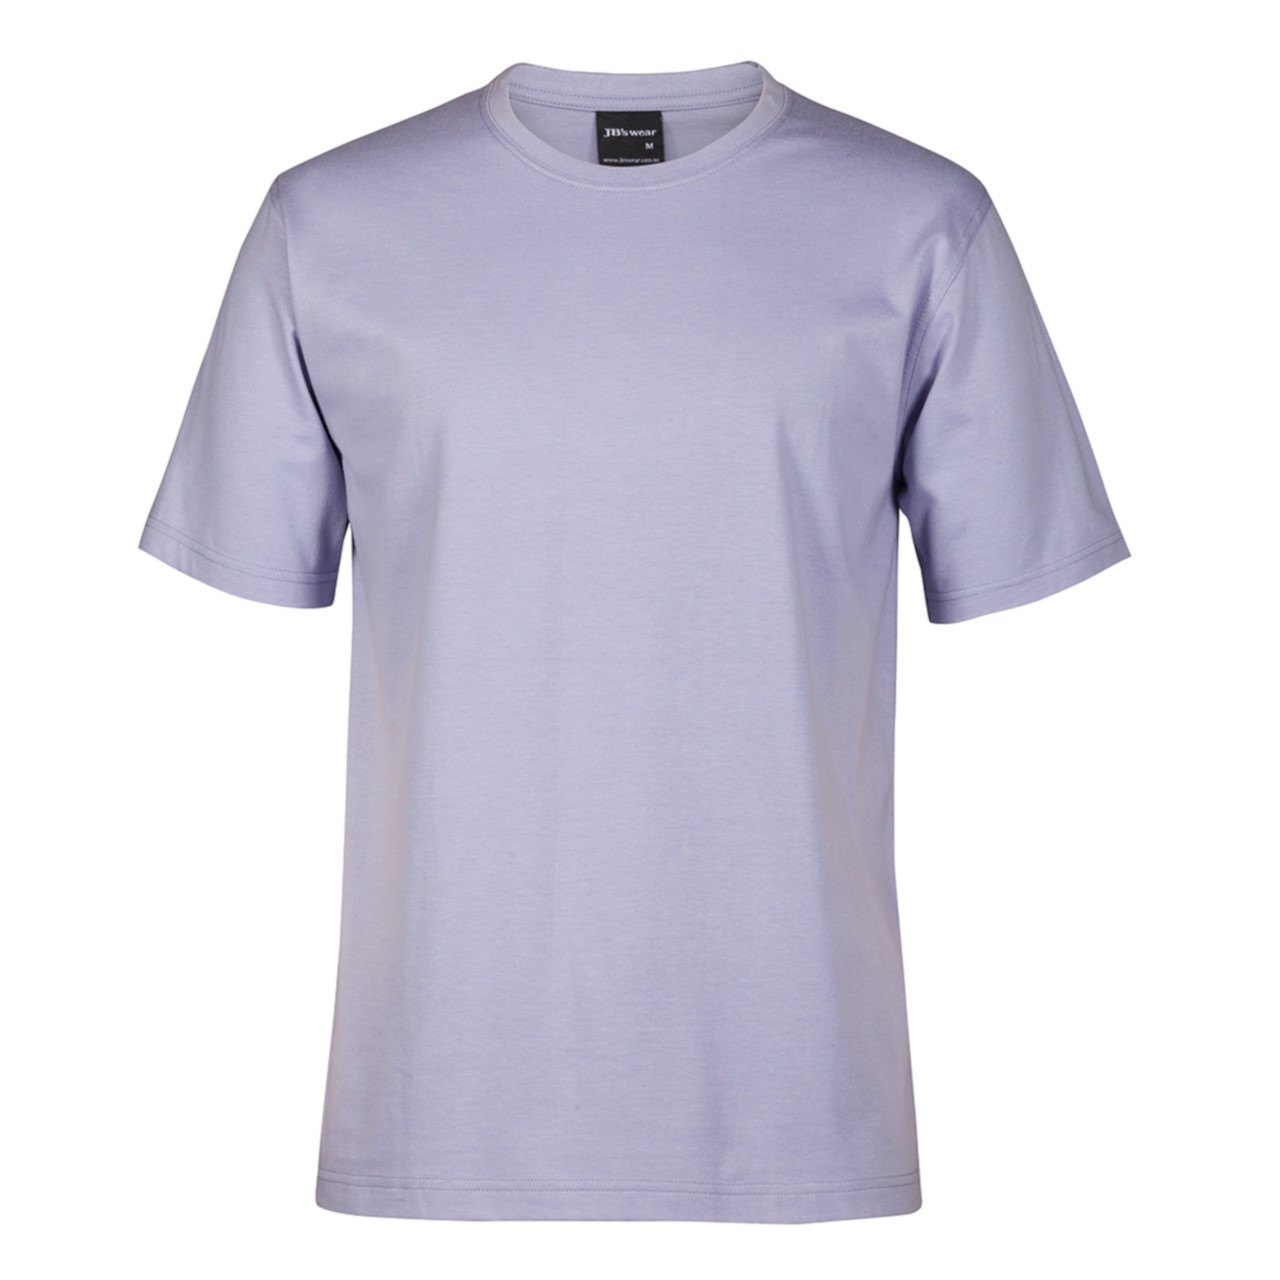 Cotton T Shirt Snugpak